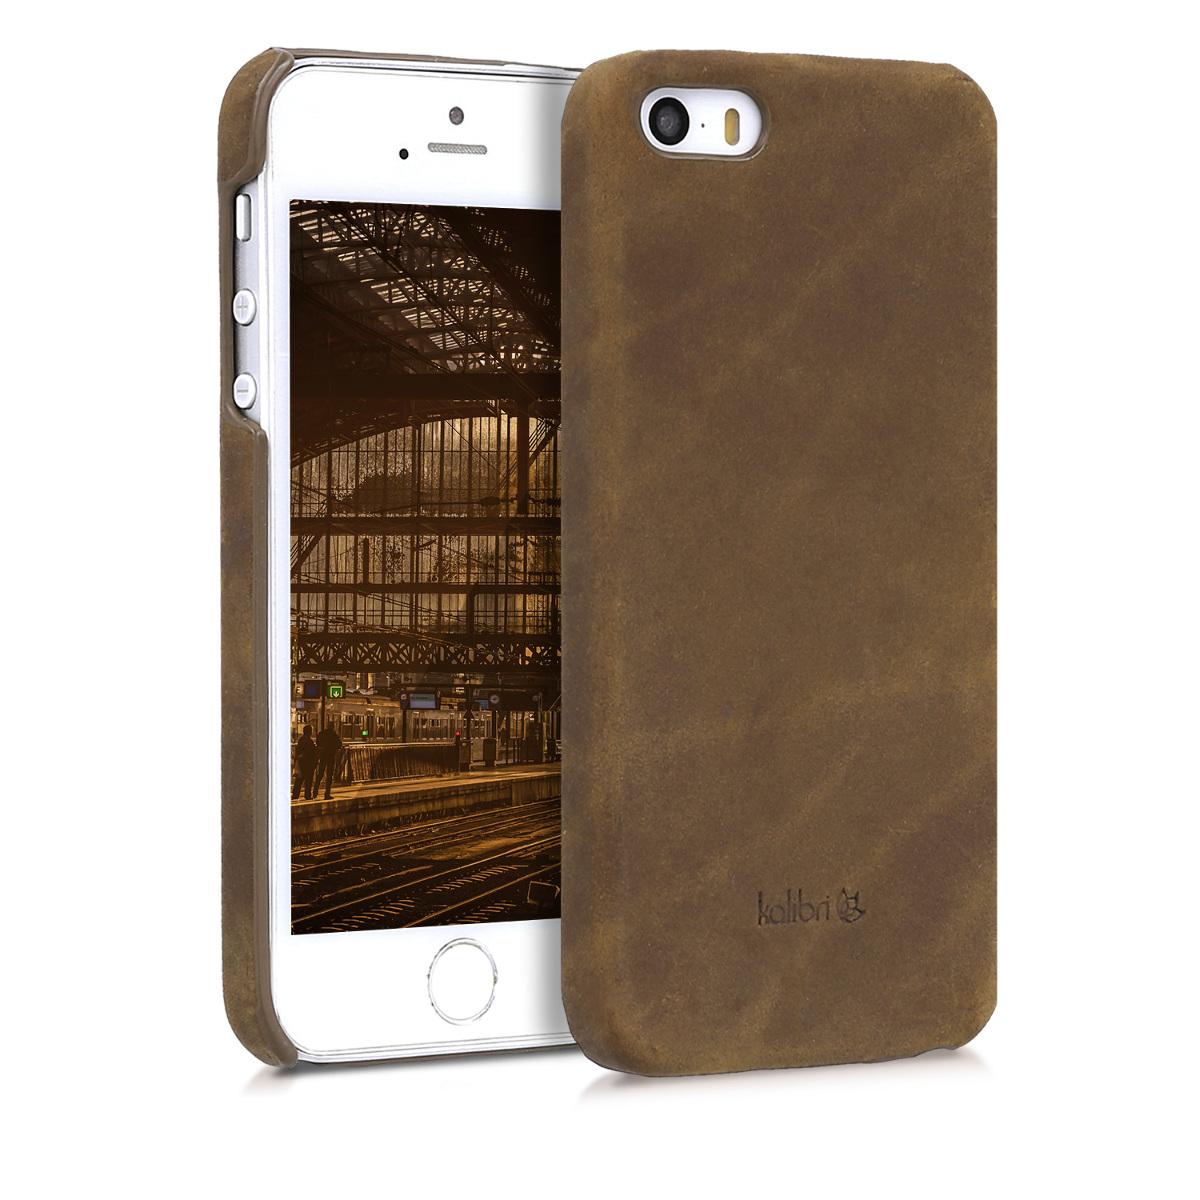 Kalibri Σκληρή Δερμάτινη Θήκη iPhone SE / 5S / 5 - Brown (38962.05)